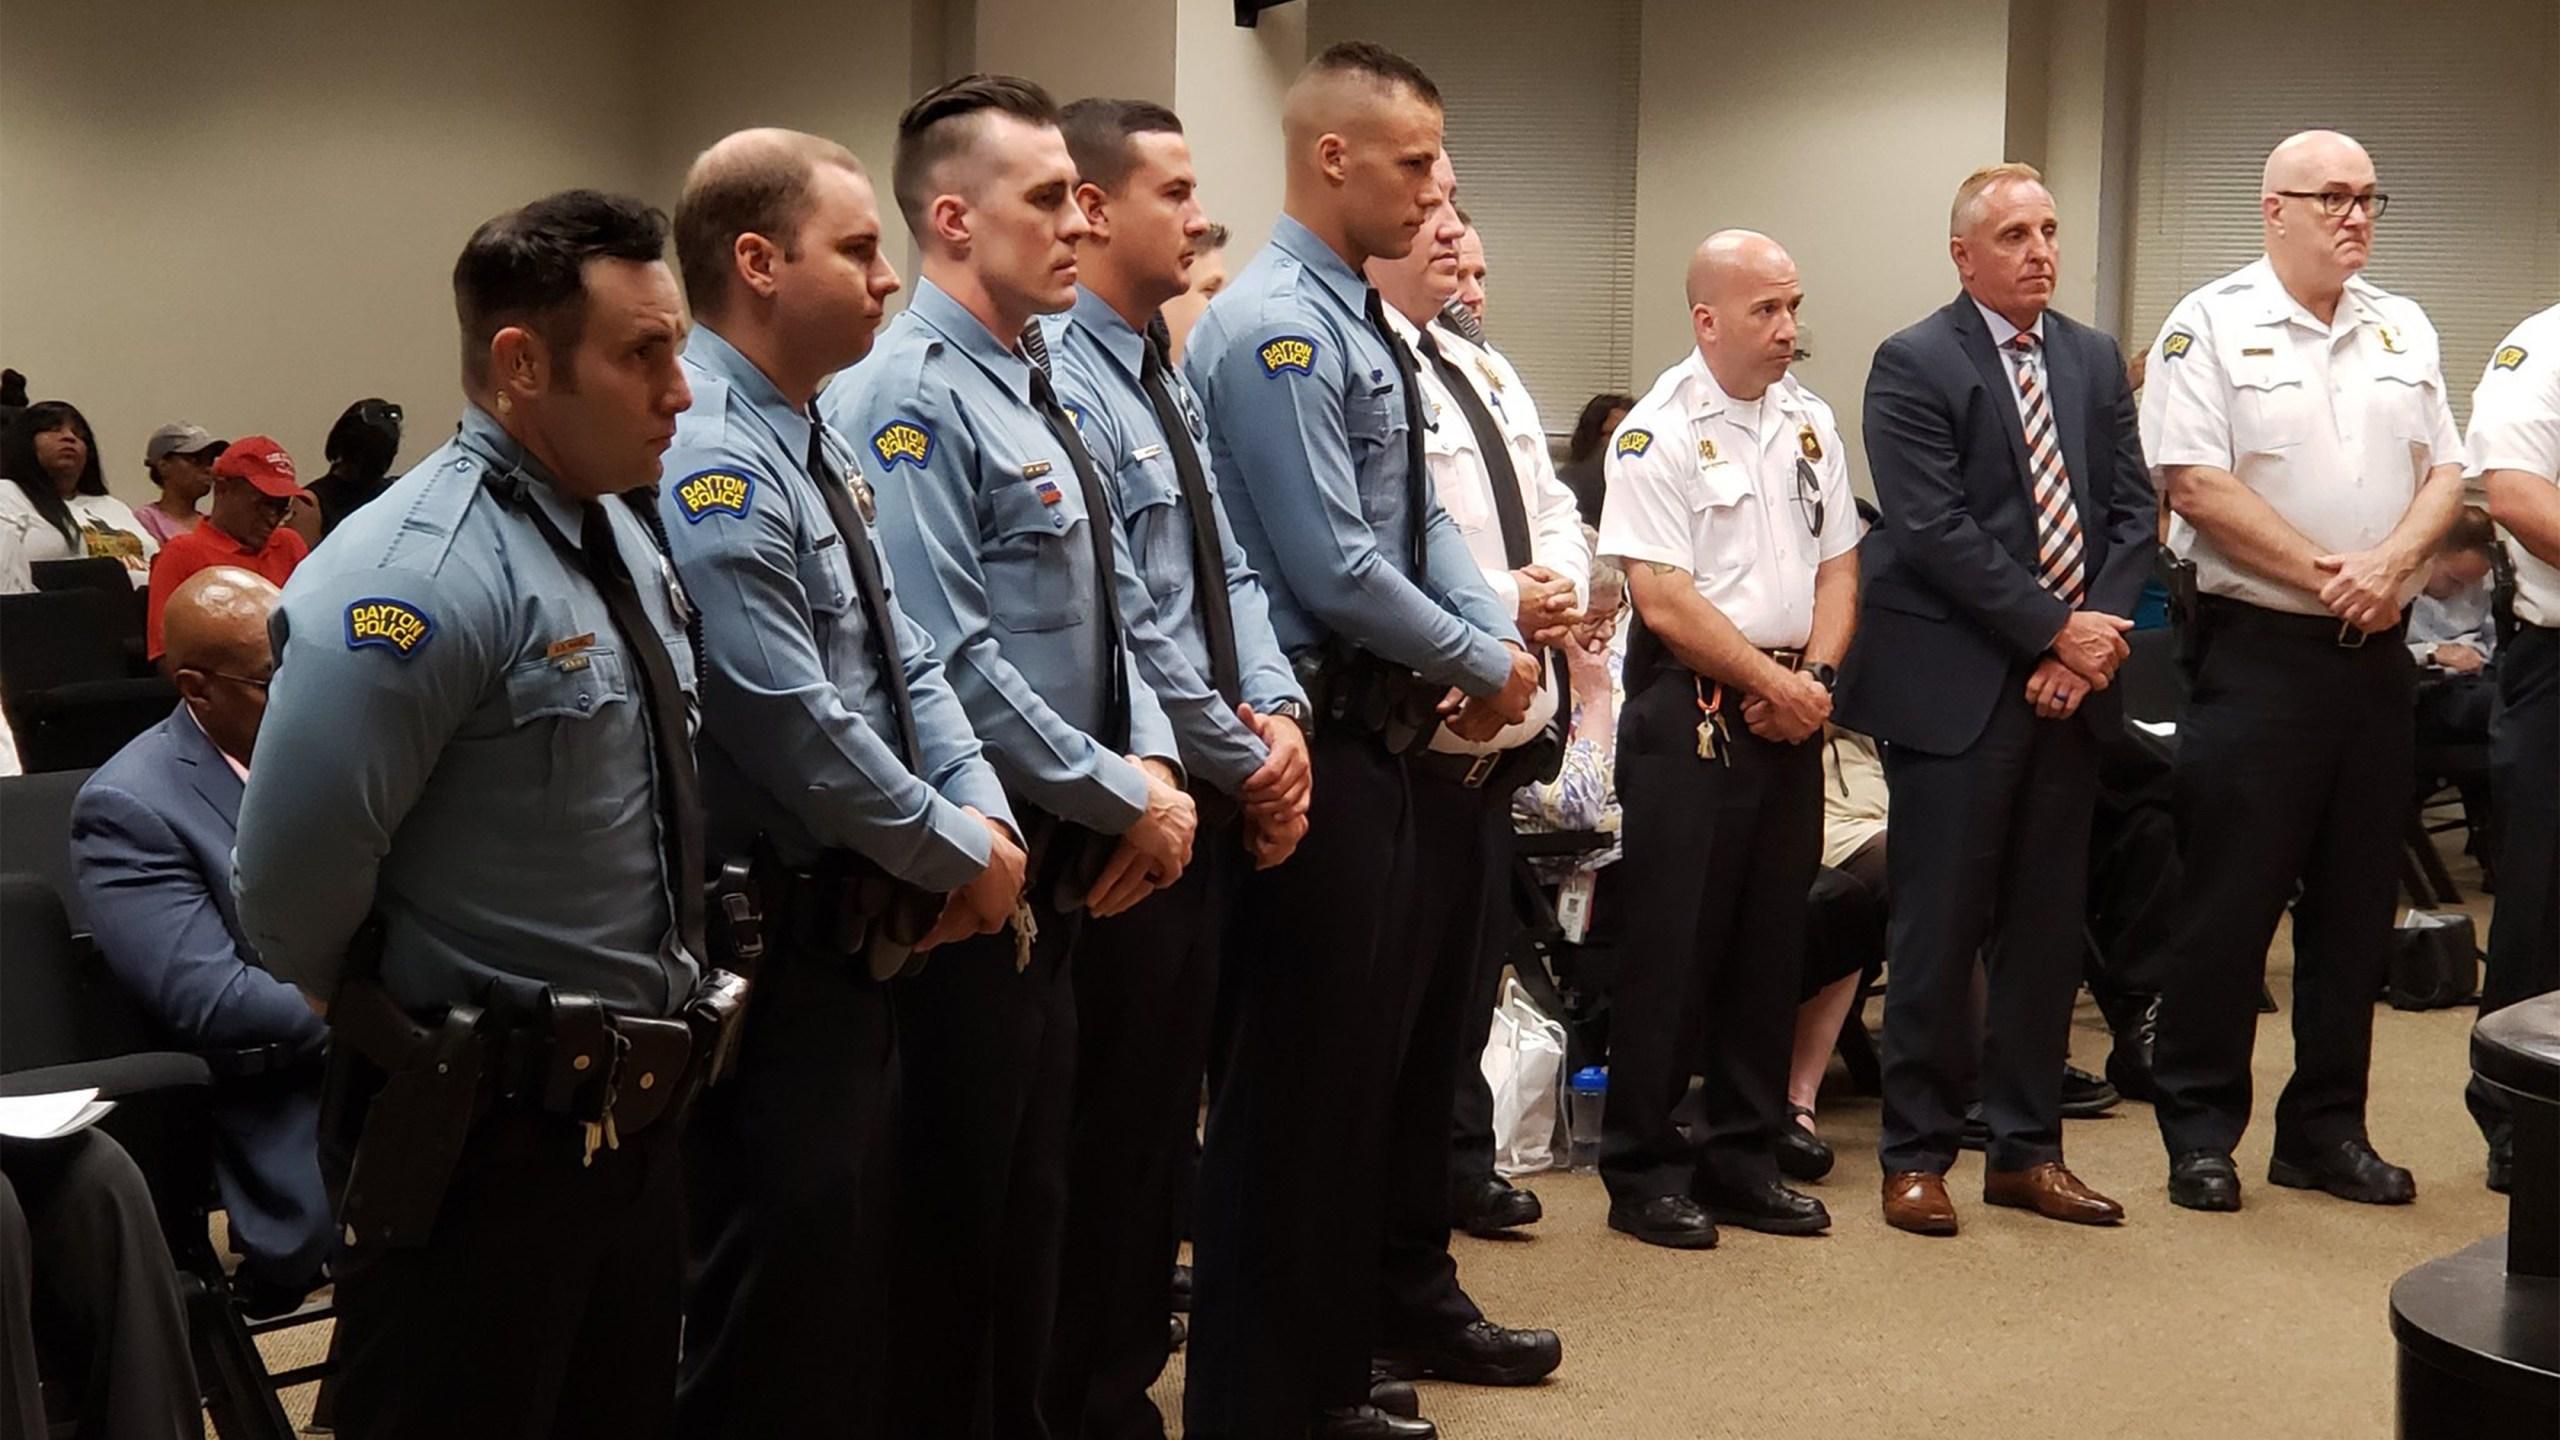 Dayton police officers